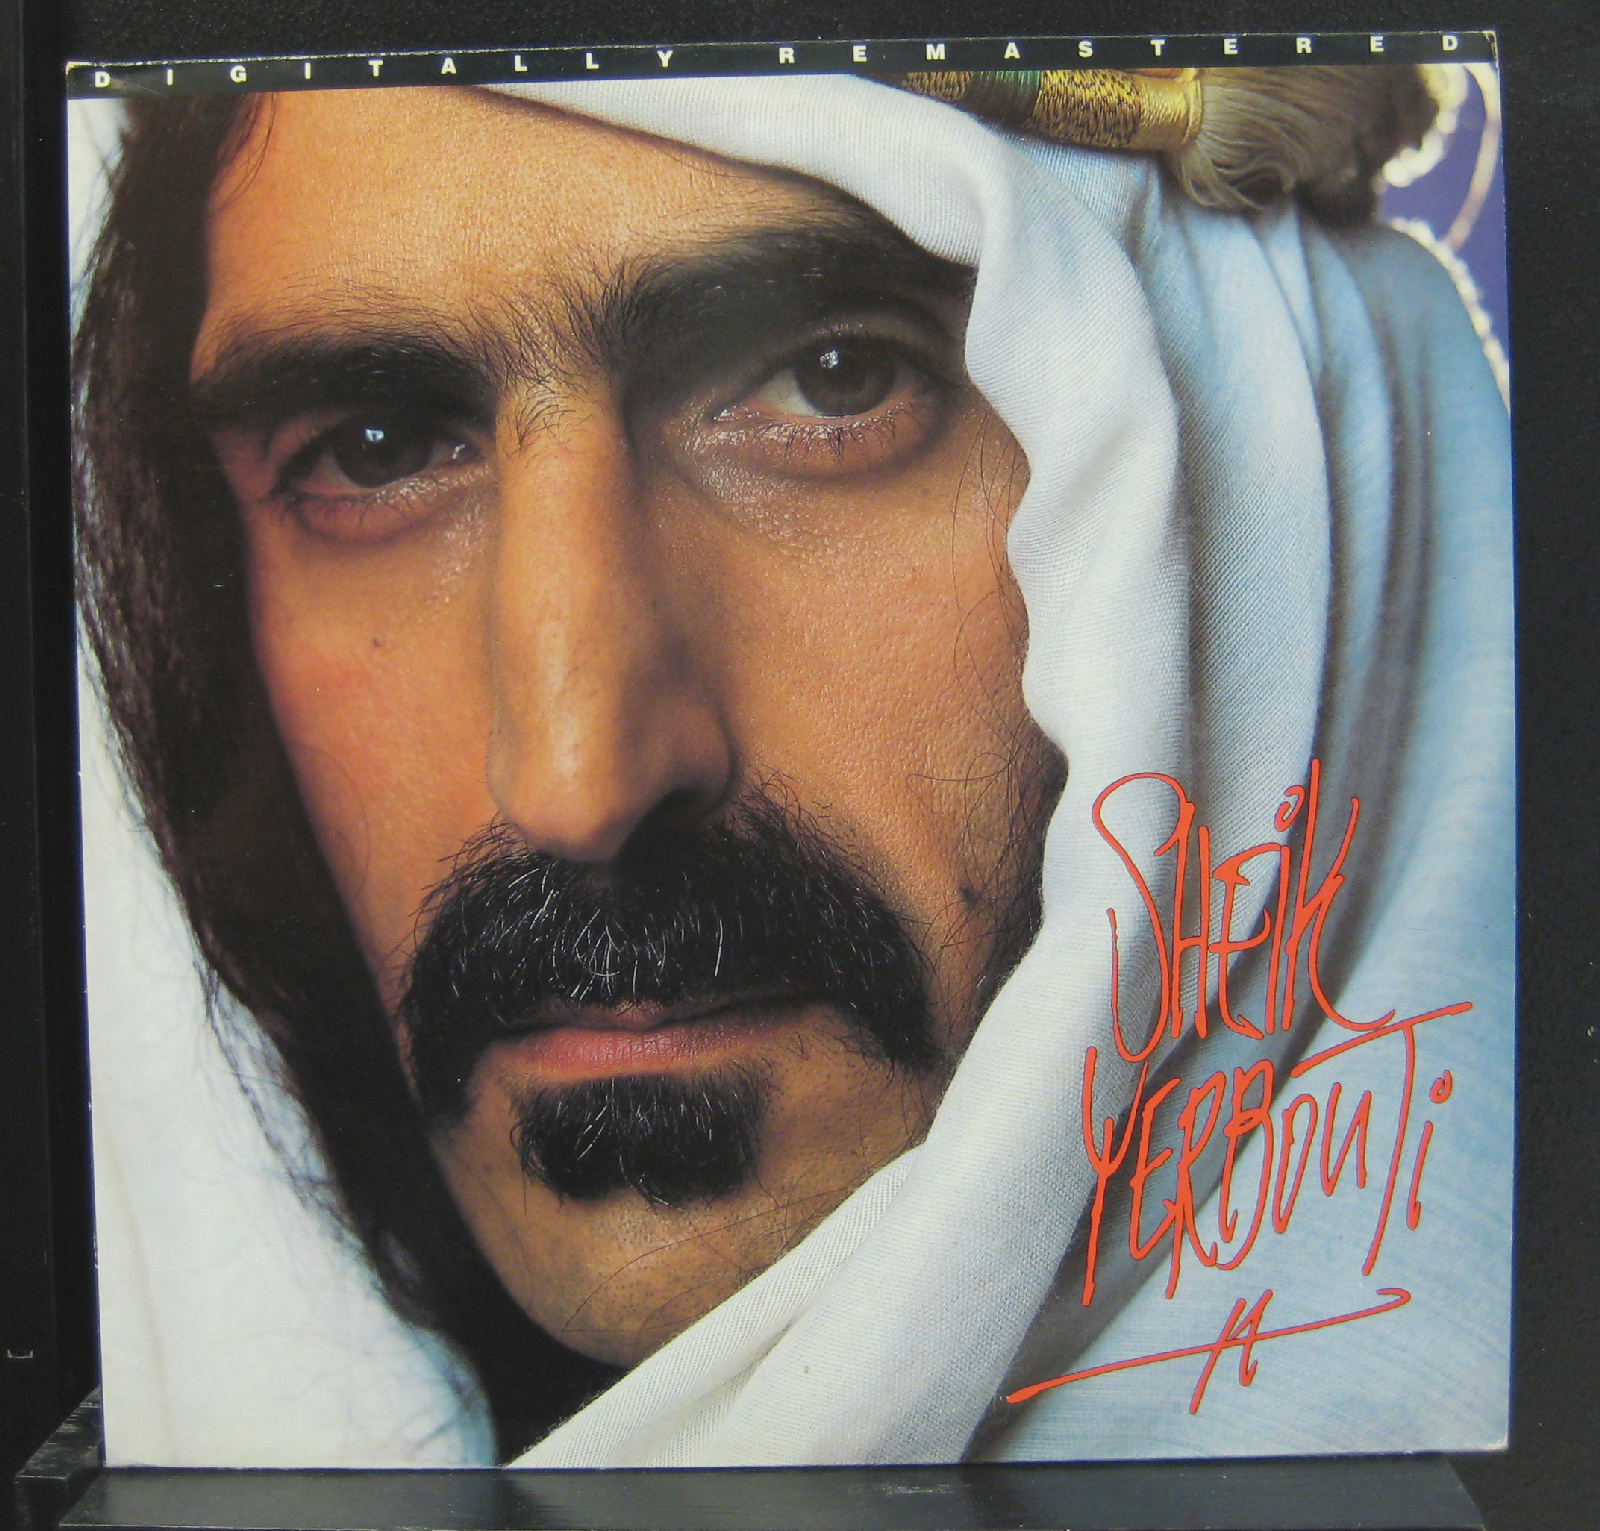 Frank Zappa Sheik Yerbouti 2 Lp Mint En 5001 Emi